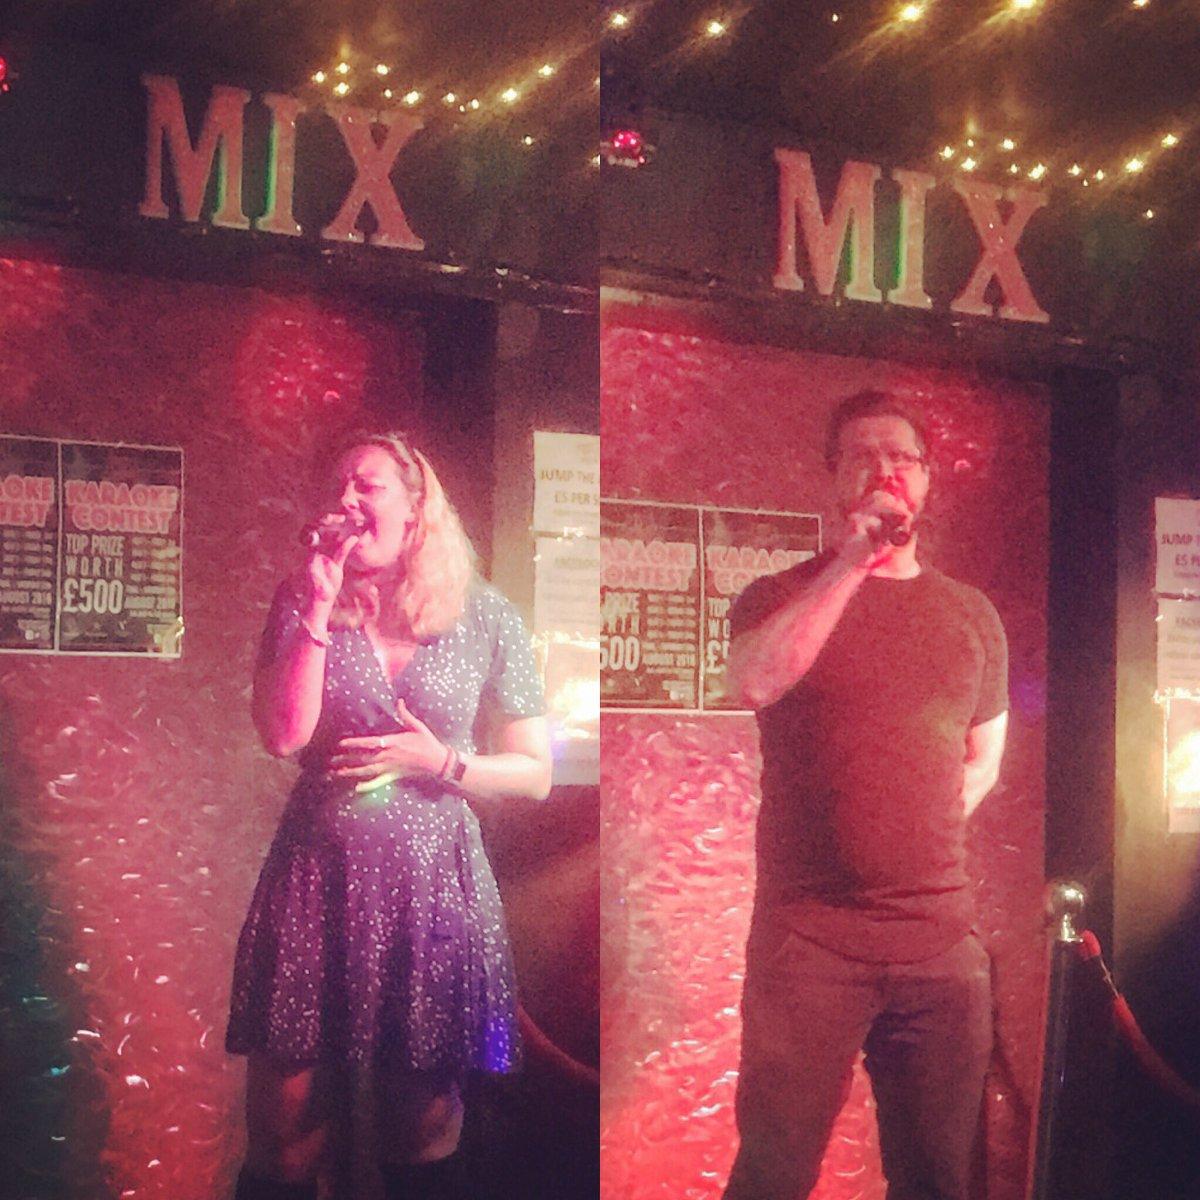 Mix Karaoke Bar (@Mix_Karaoke) | Twitter